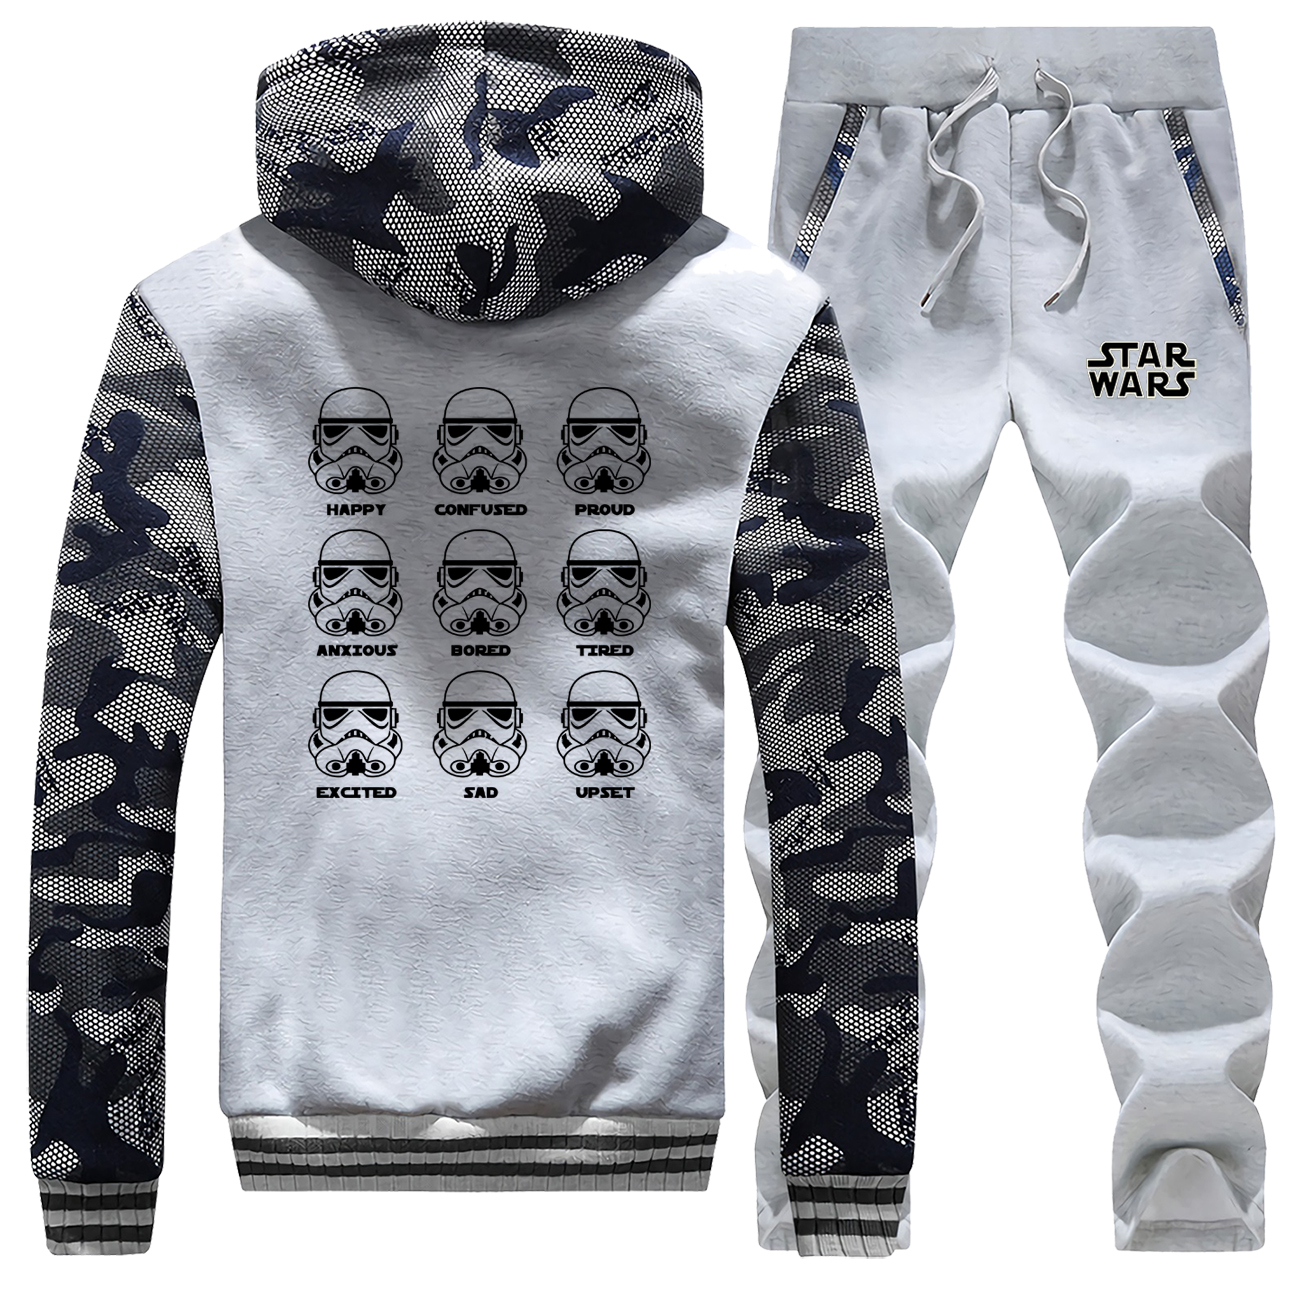 Funny Star Wars Thick Hoodies 2019 Winter Stormtrooper Emotions Male Set Camouflage Pants Sweatshirts Warm Fashion Men's Jacket